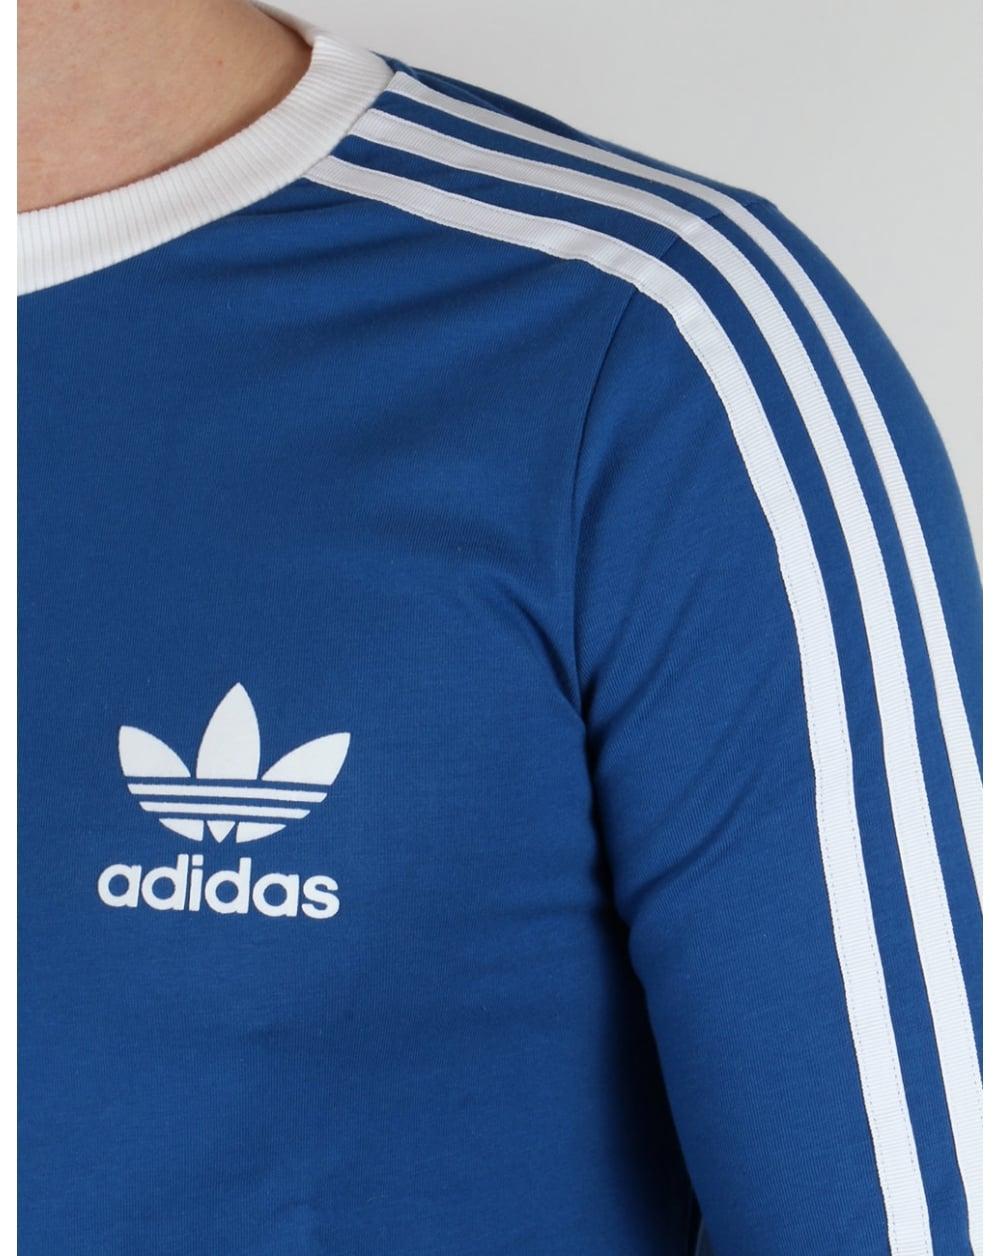 Adidas Originals 3 Stripes Long Sleeve T Shirt Eqt Blue Tee Trefoil